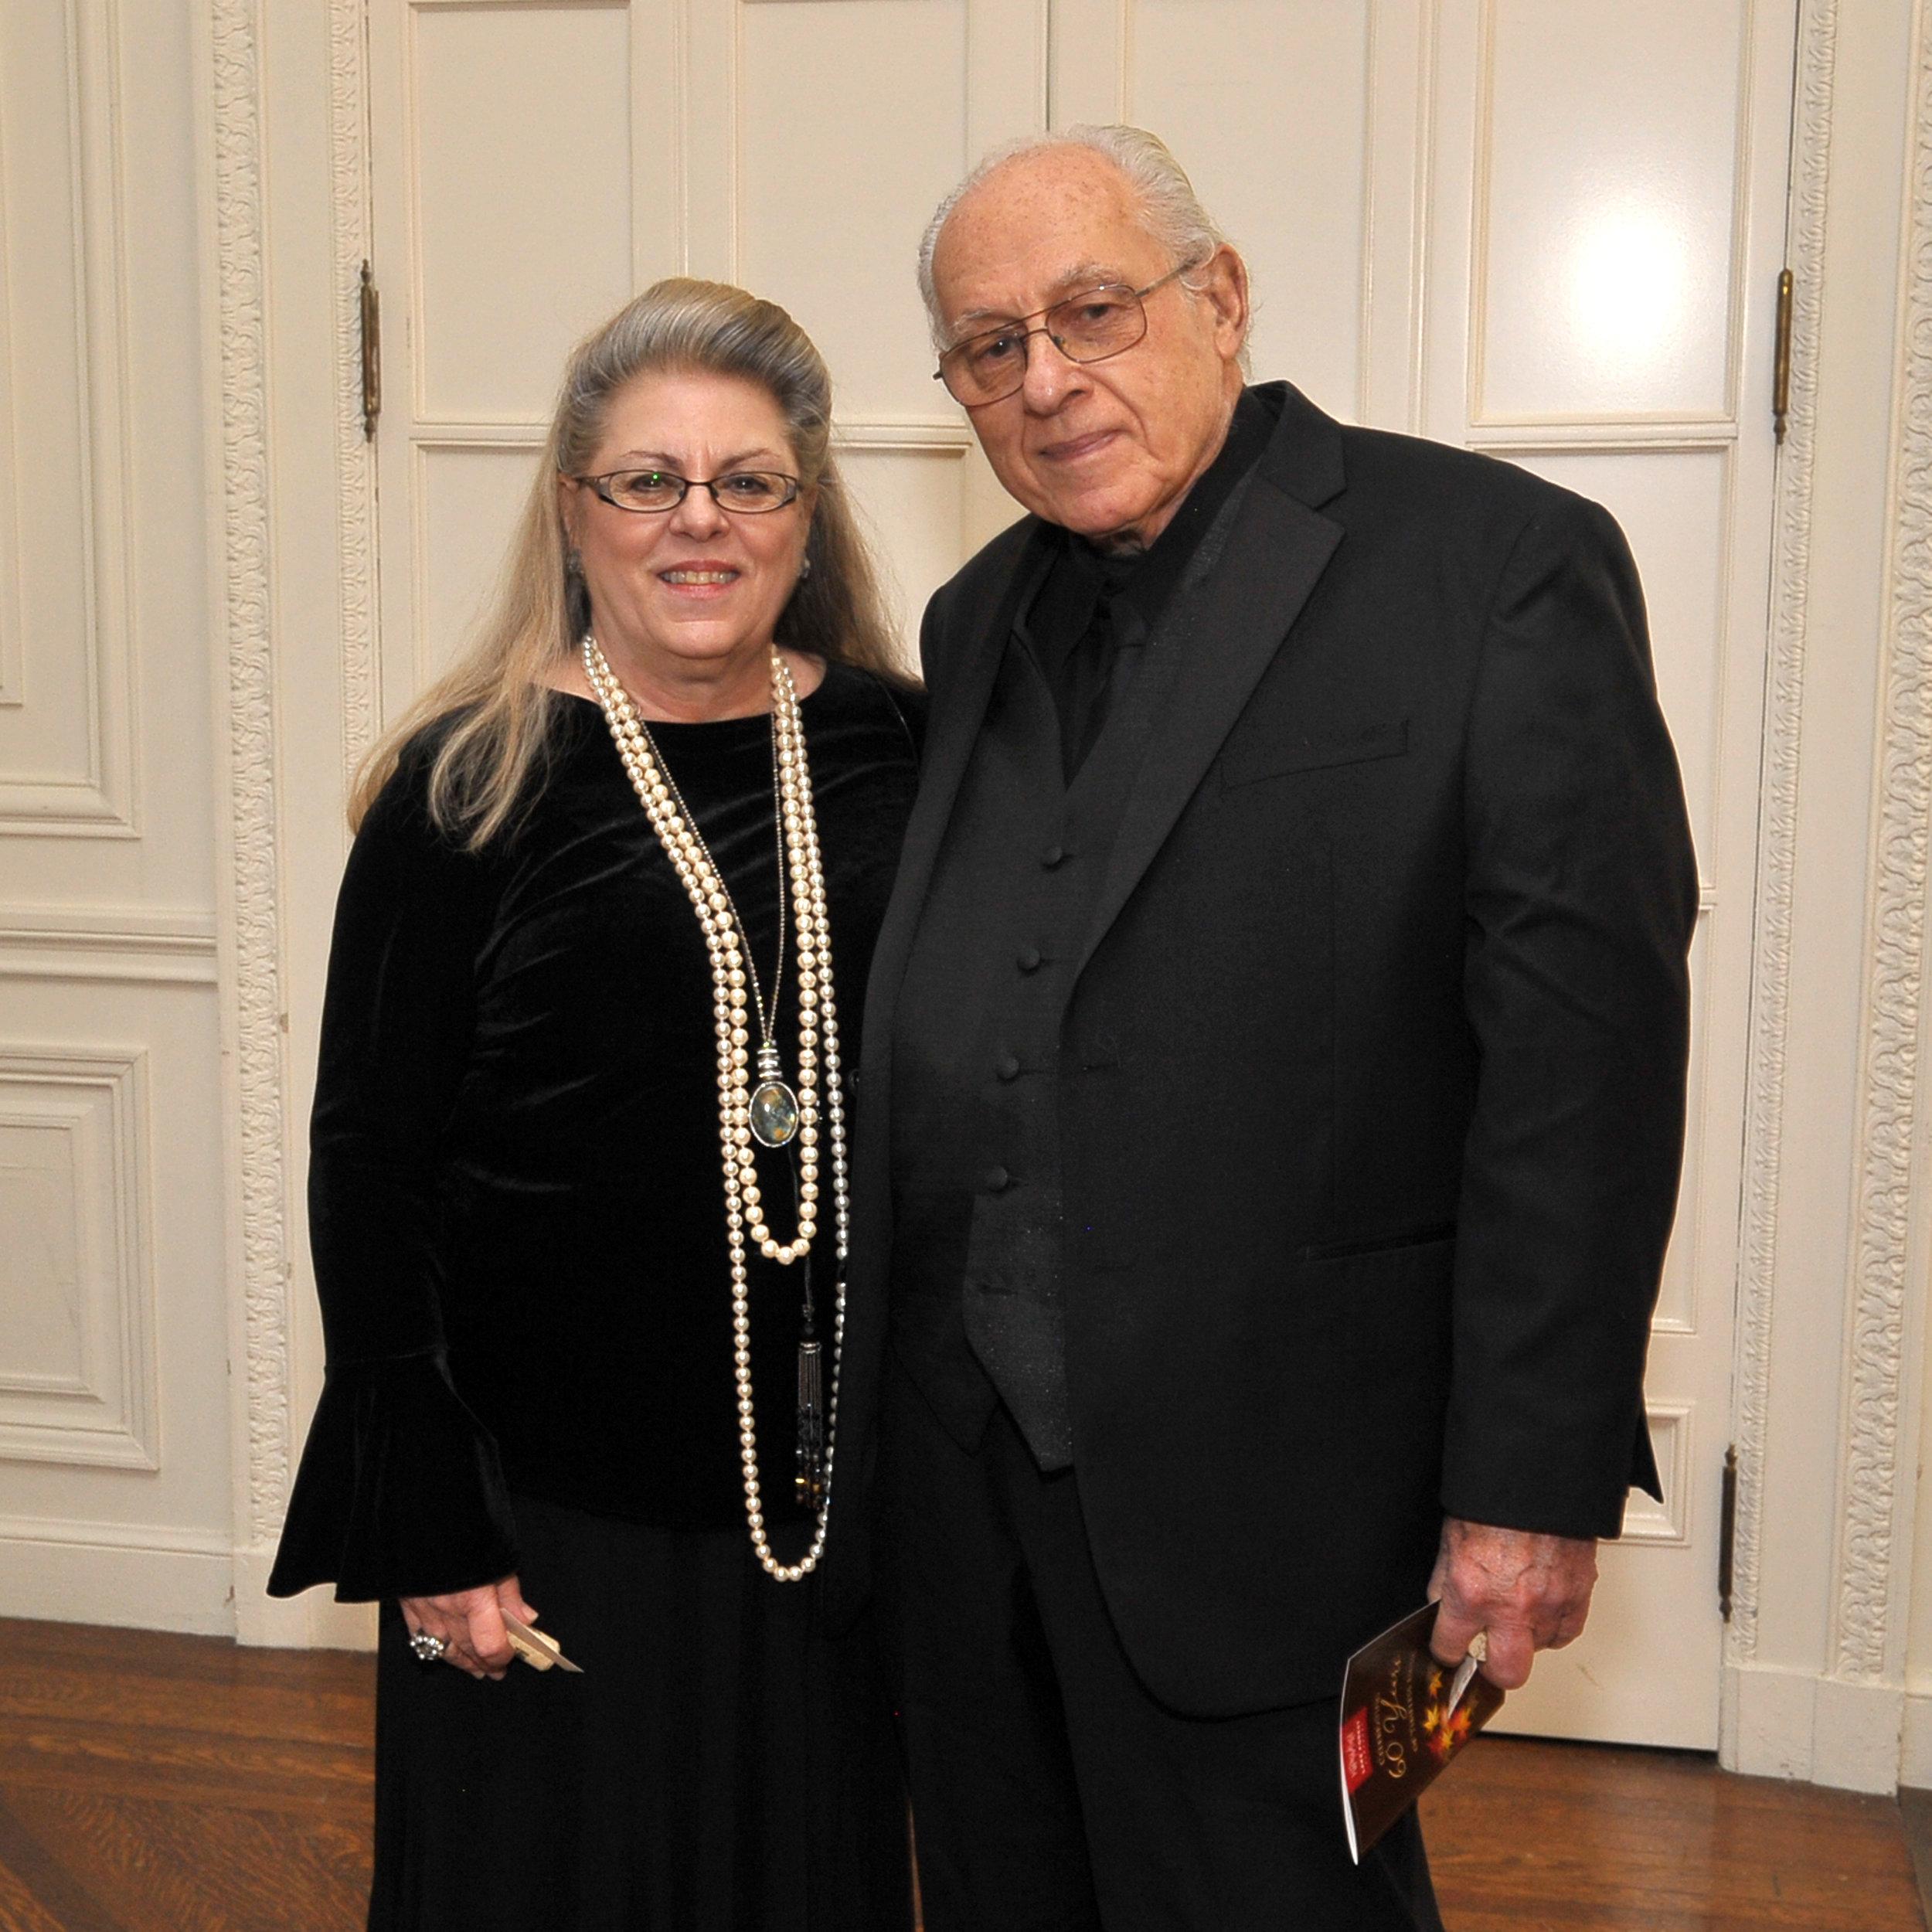 Gail McGrath and Sheldon Levin